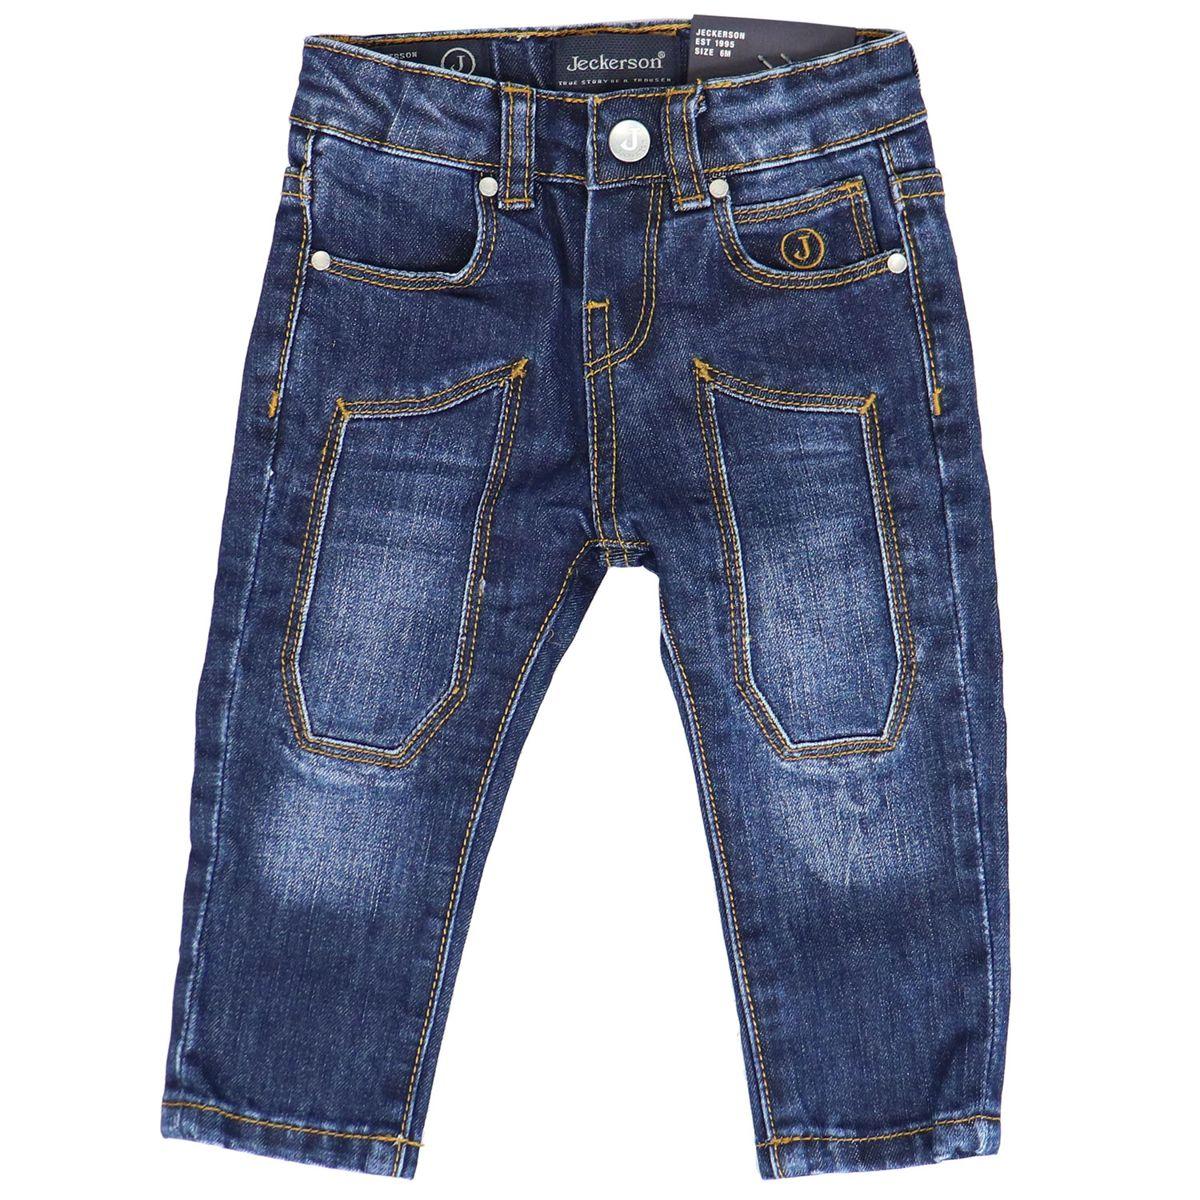 Slim jeans 5 pockets model with patches Dark denim Jeckerson